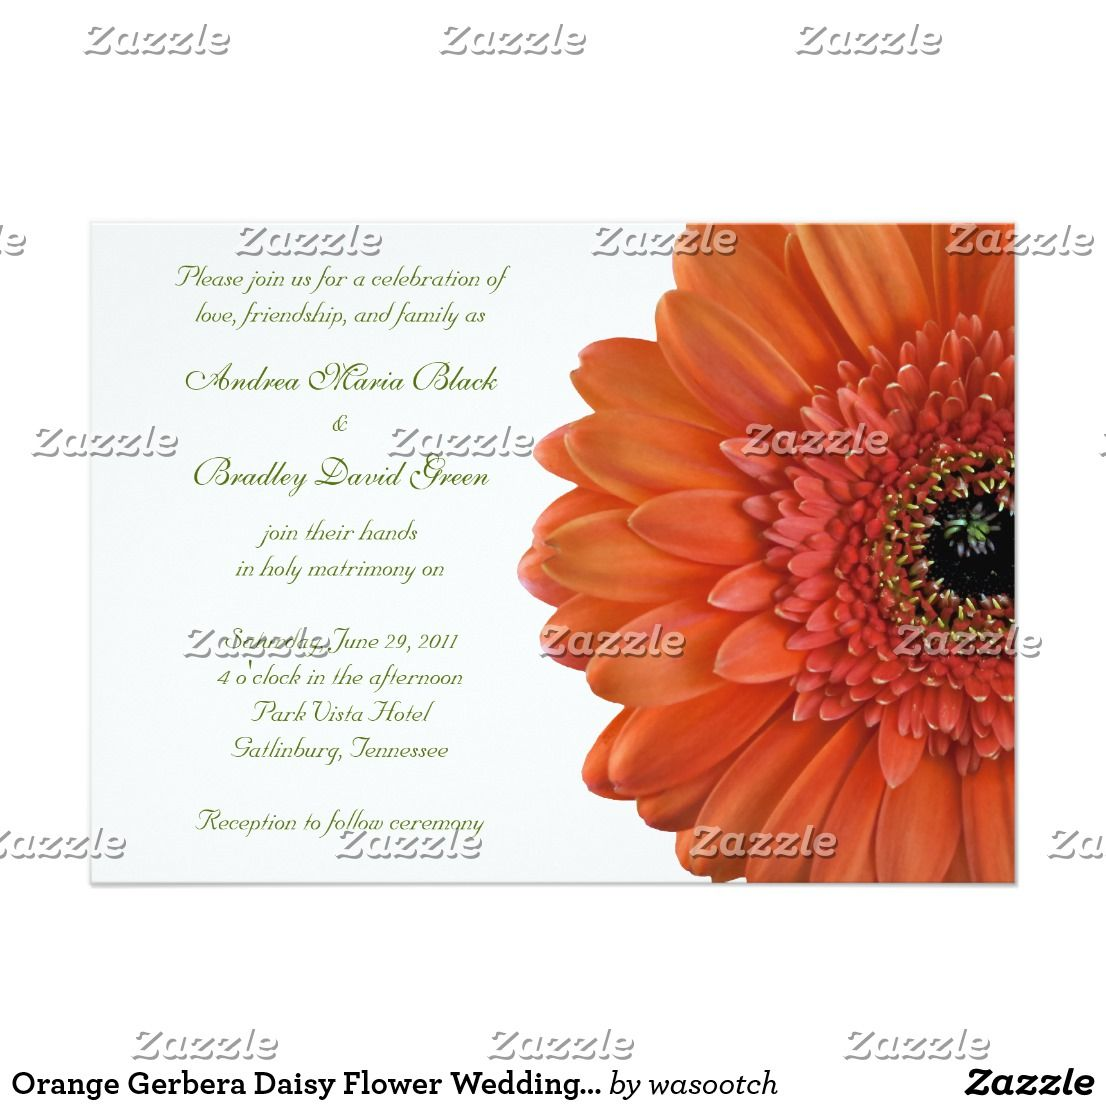 Orange Gerbera Daisy Flower Wedding Invitation | Country Style ...